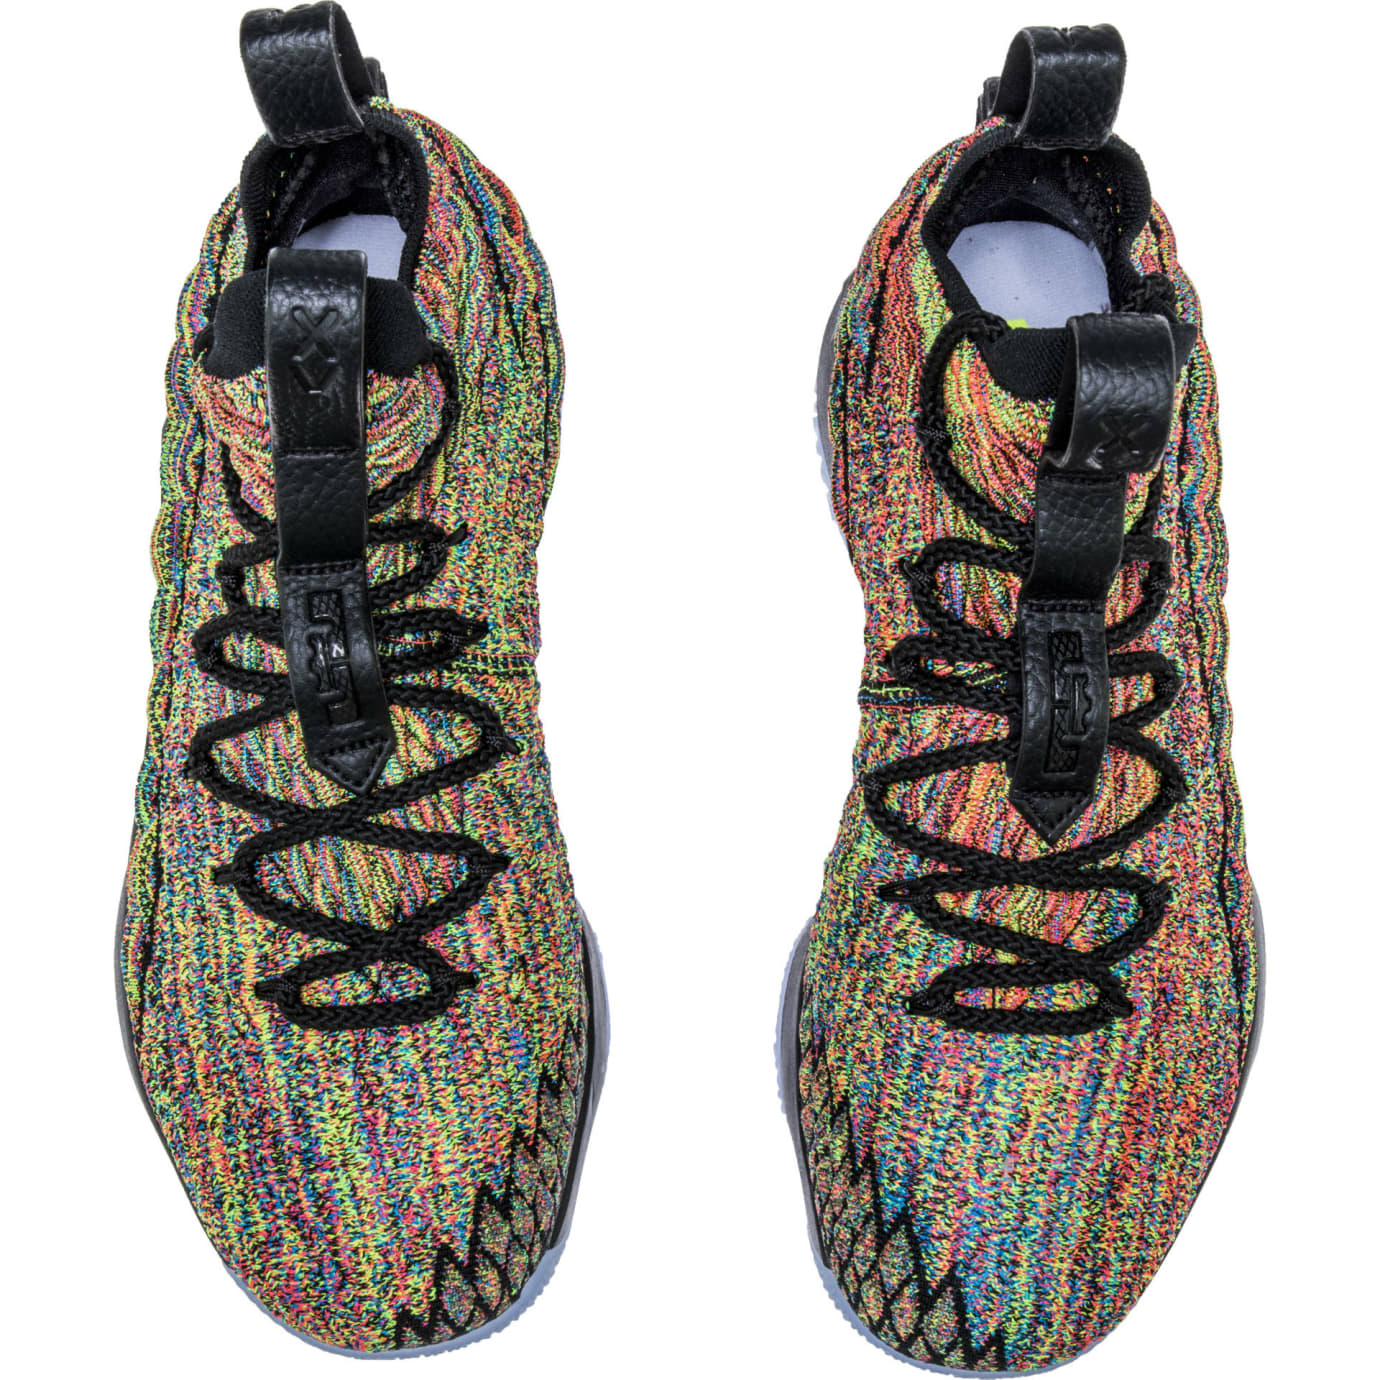 37552f764fb Nike LeBron 15 Black Four Horsemen Release Date 897648-901